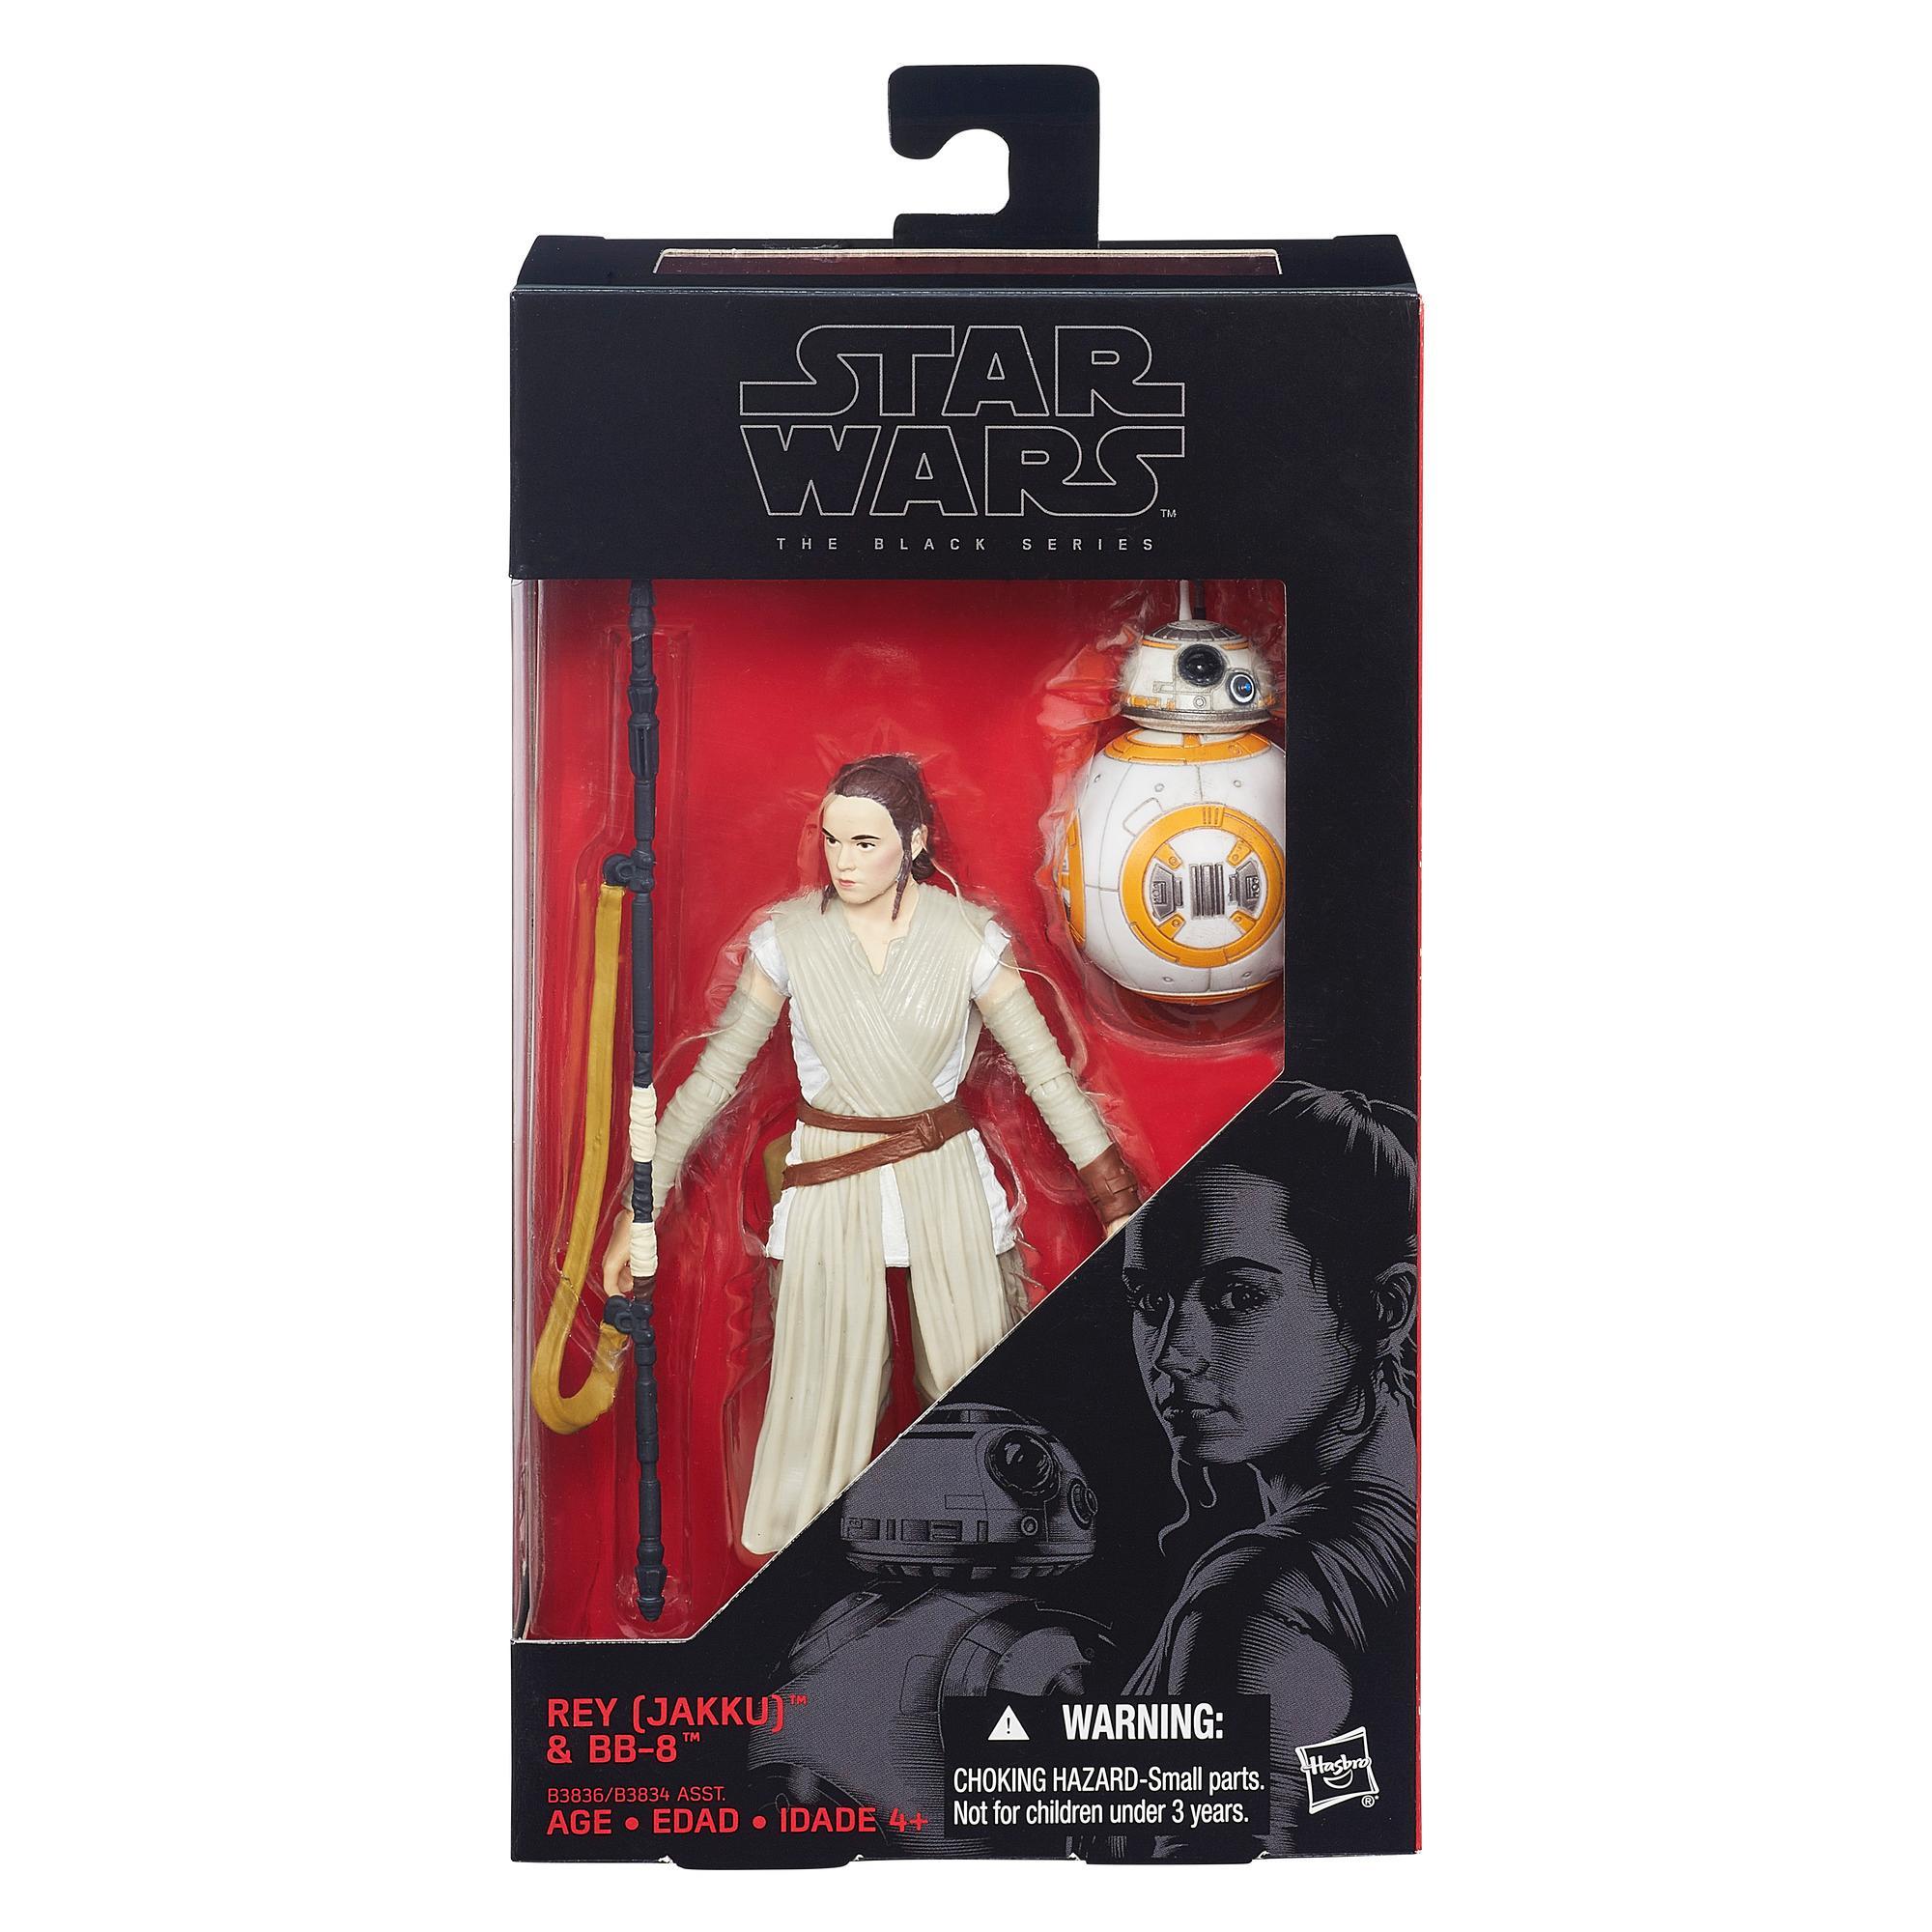 Star Wars - Rey e BB-8 de 15,25 cm (Jakku) Black Series